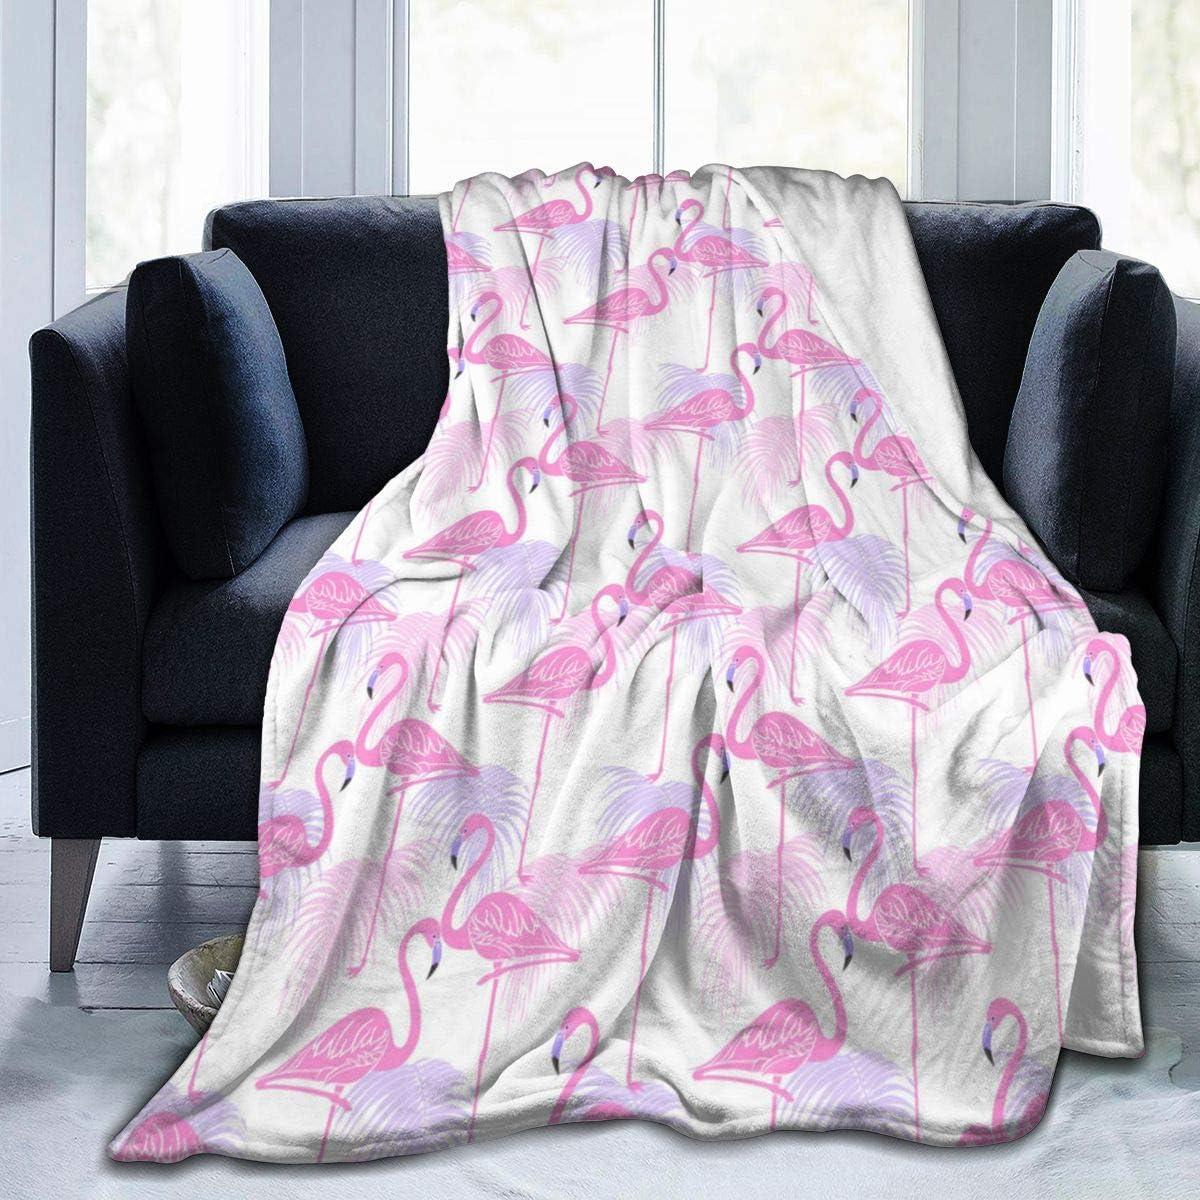 CUTEDWARF Pink Cute Flamingo2 Lightweight Bedroom Free Shipping Cheap Fashion Bargain Gift Warm Living Co